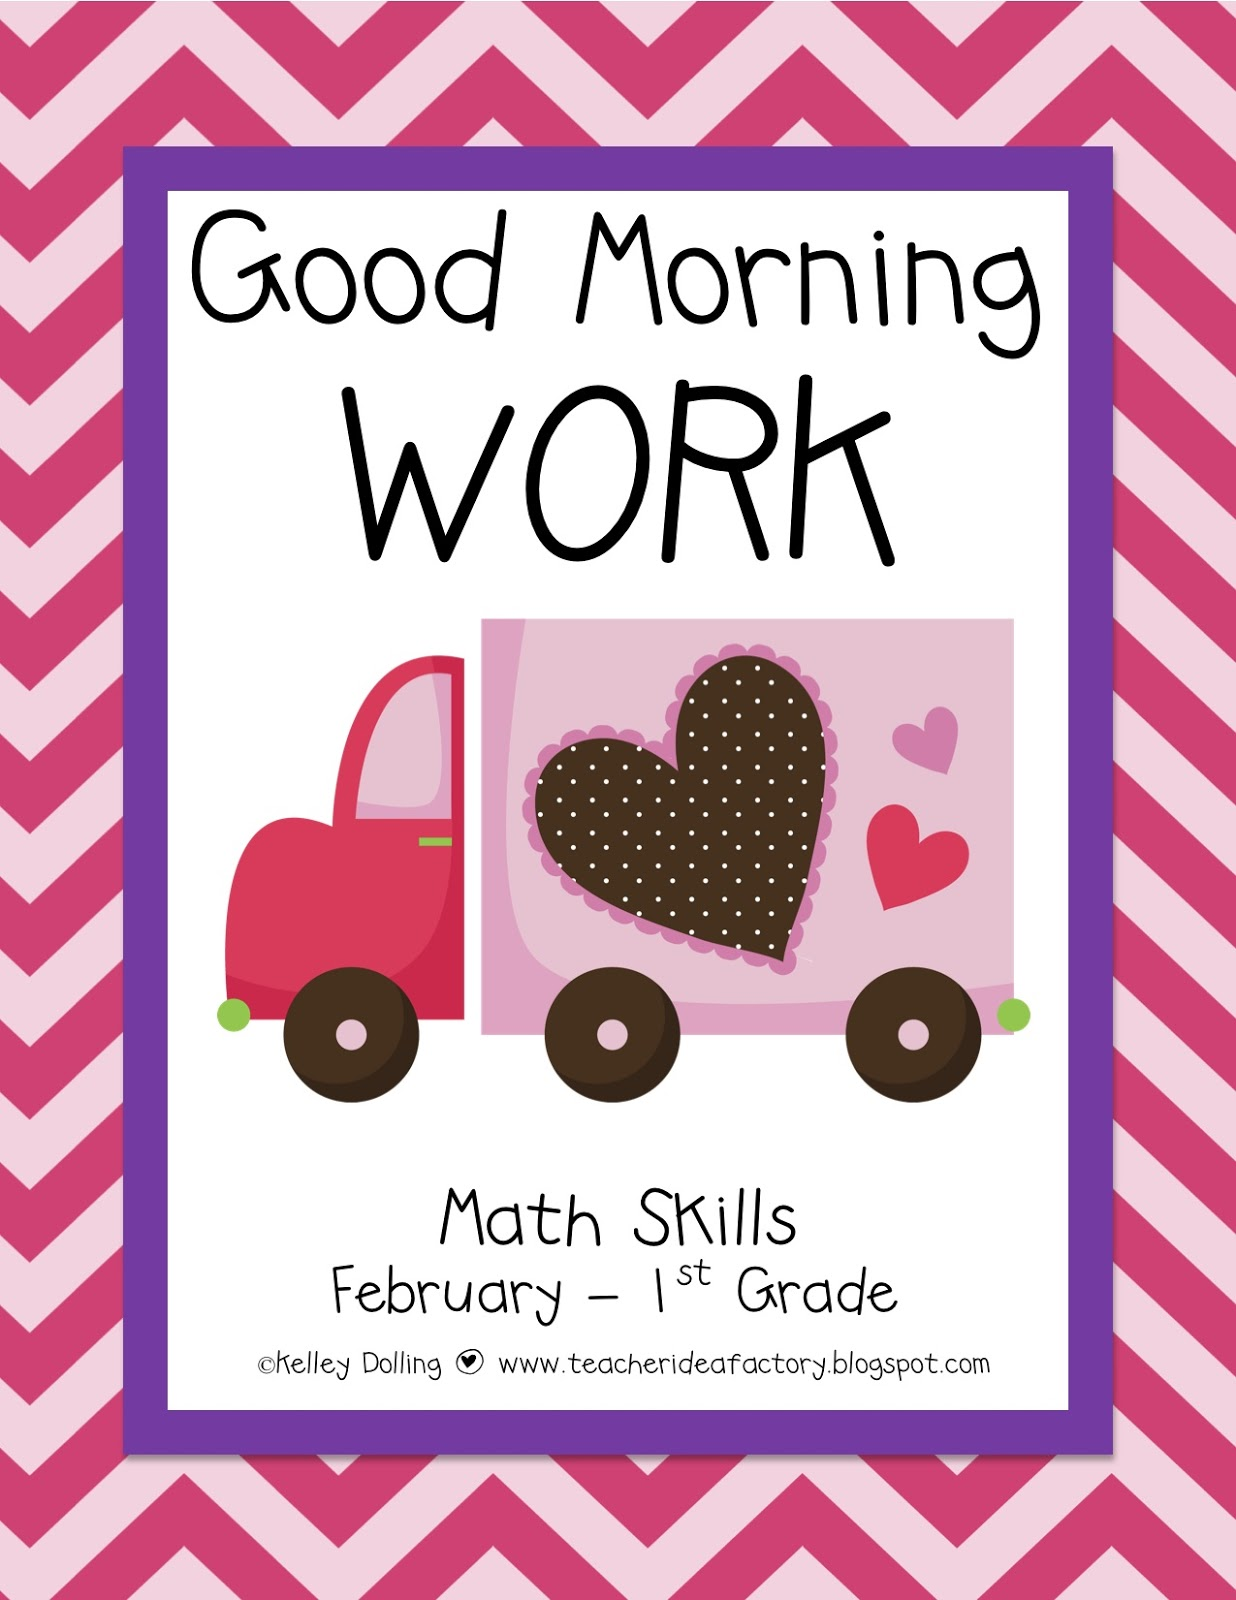 Teacher Idea Factory February Good Morning Work